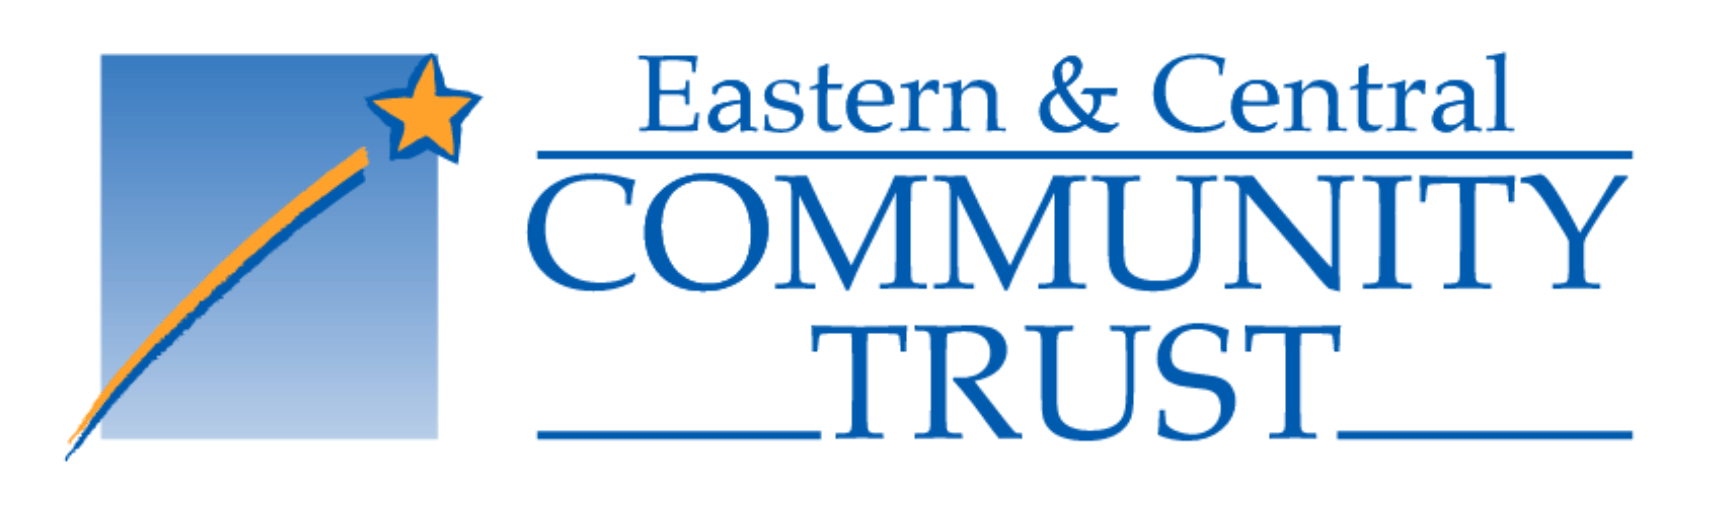 Eastern-&-Central-Community-Trust-logo